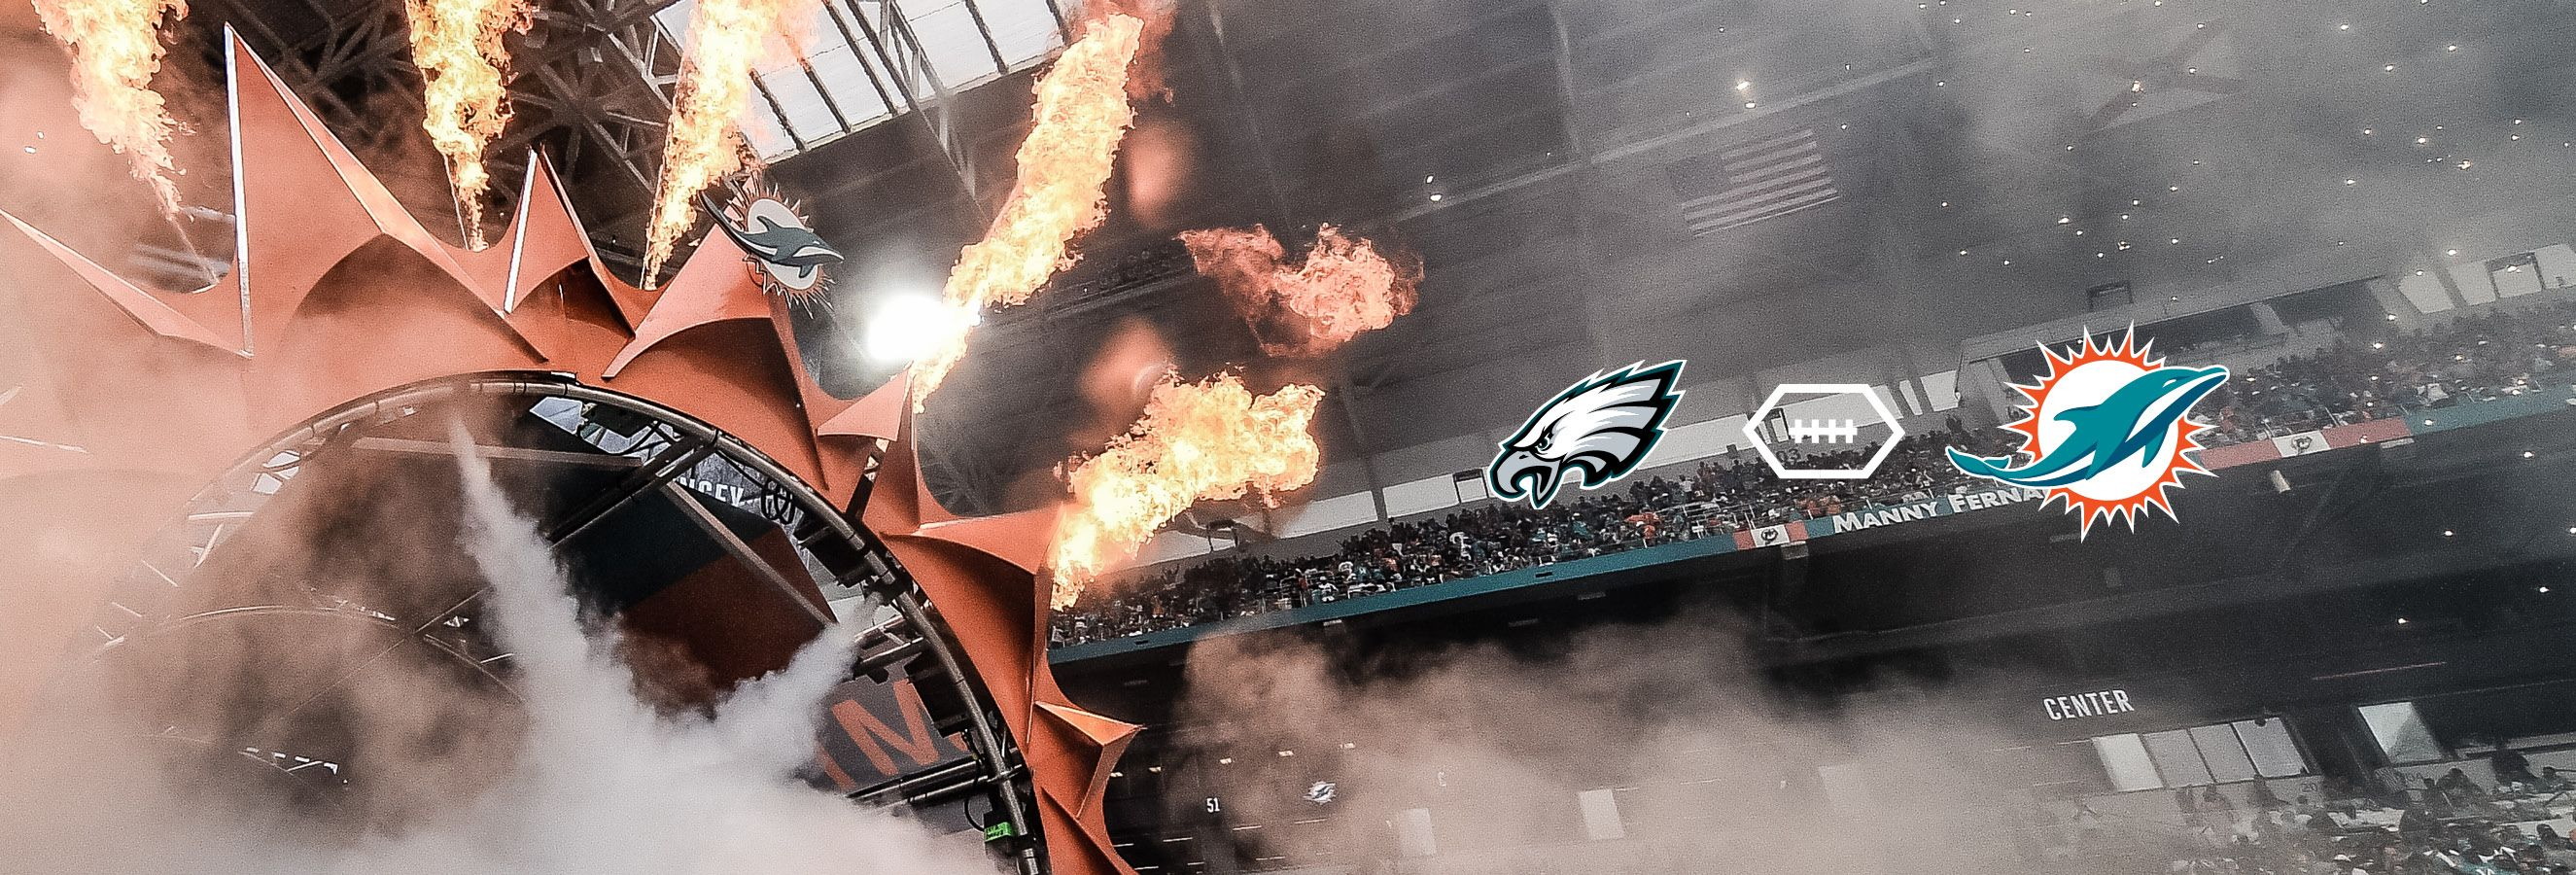 Home_Game_Invites_Eagles